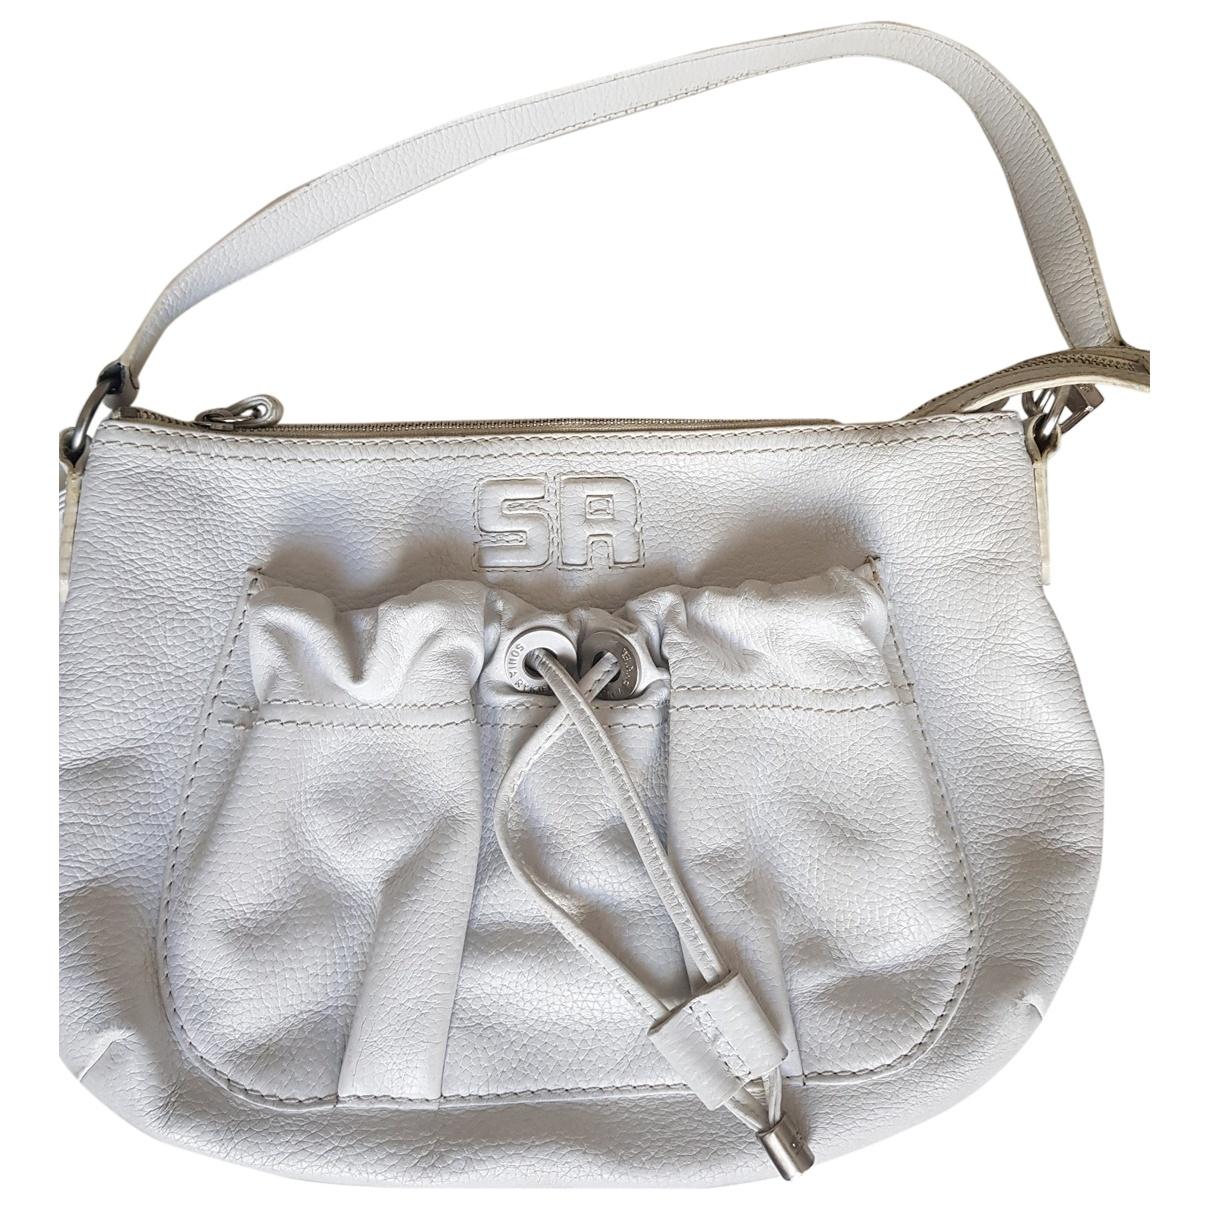 Sonia Rykiel \N Handtasche in  Weiss Leder